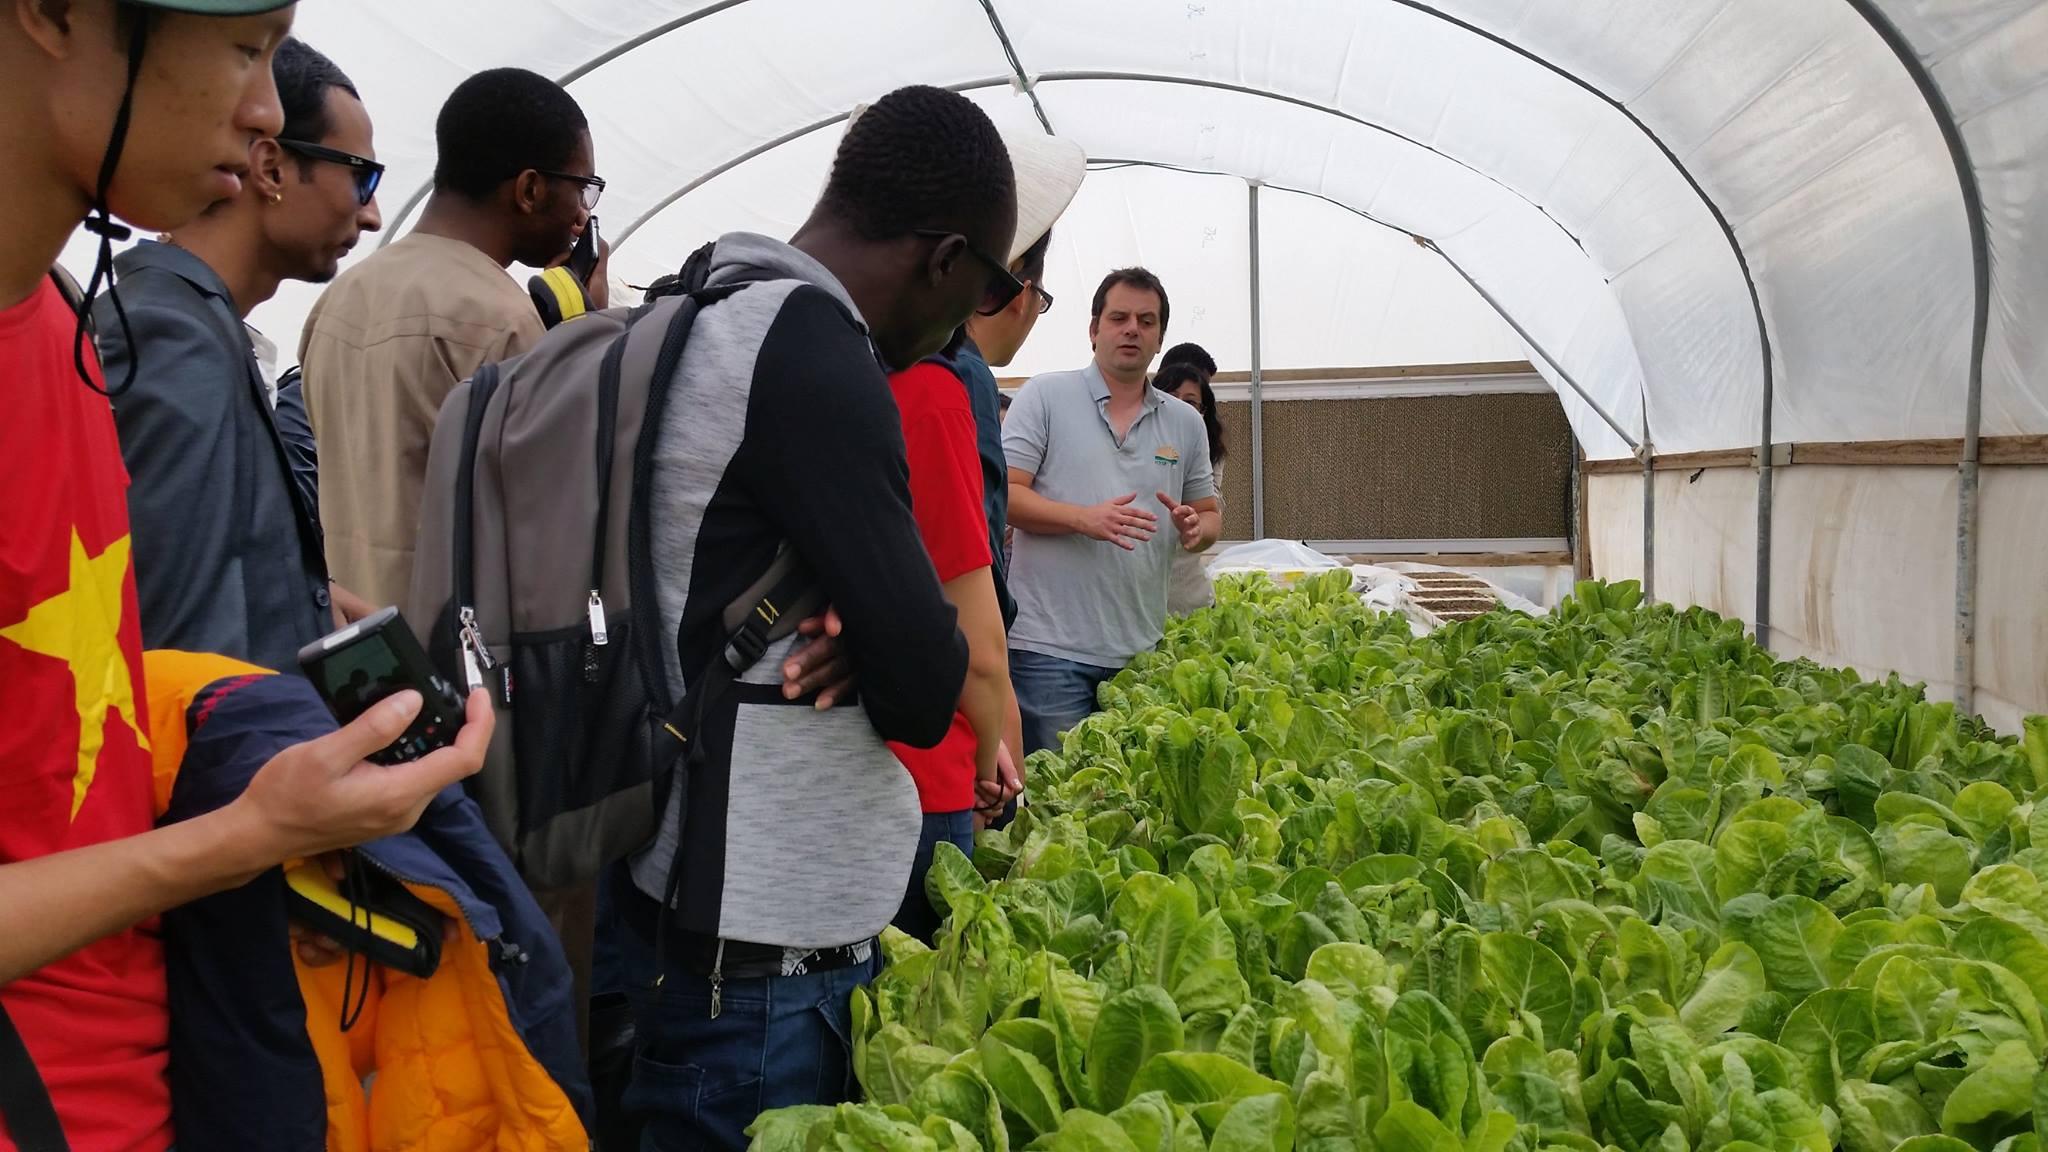 AICAT students learning from an Israeli farmer. Photo: courtesy